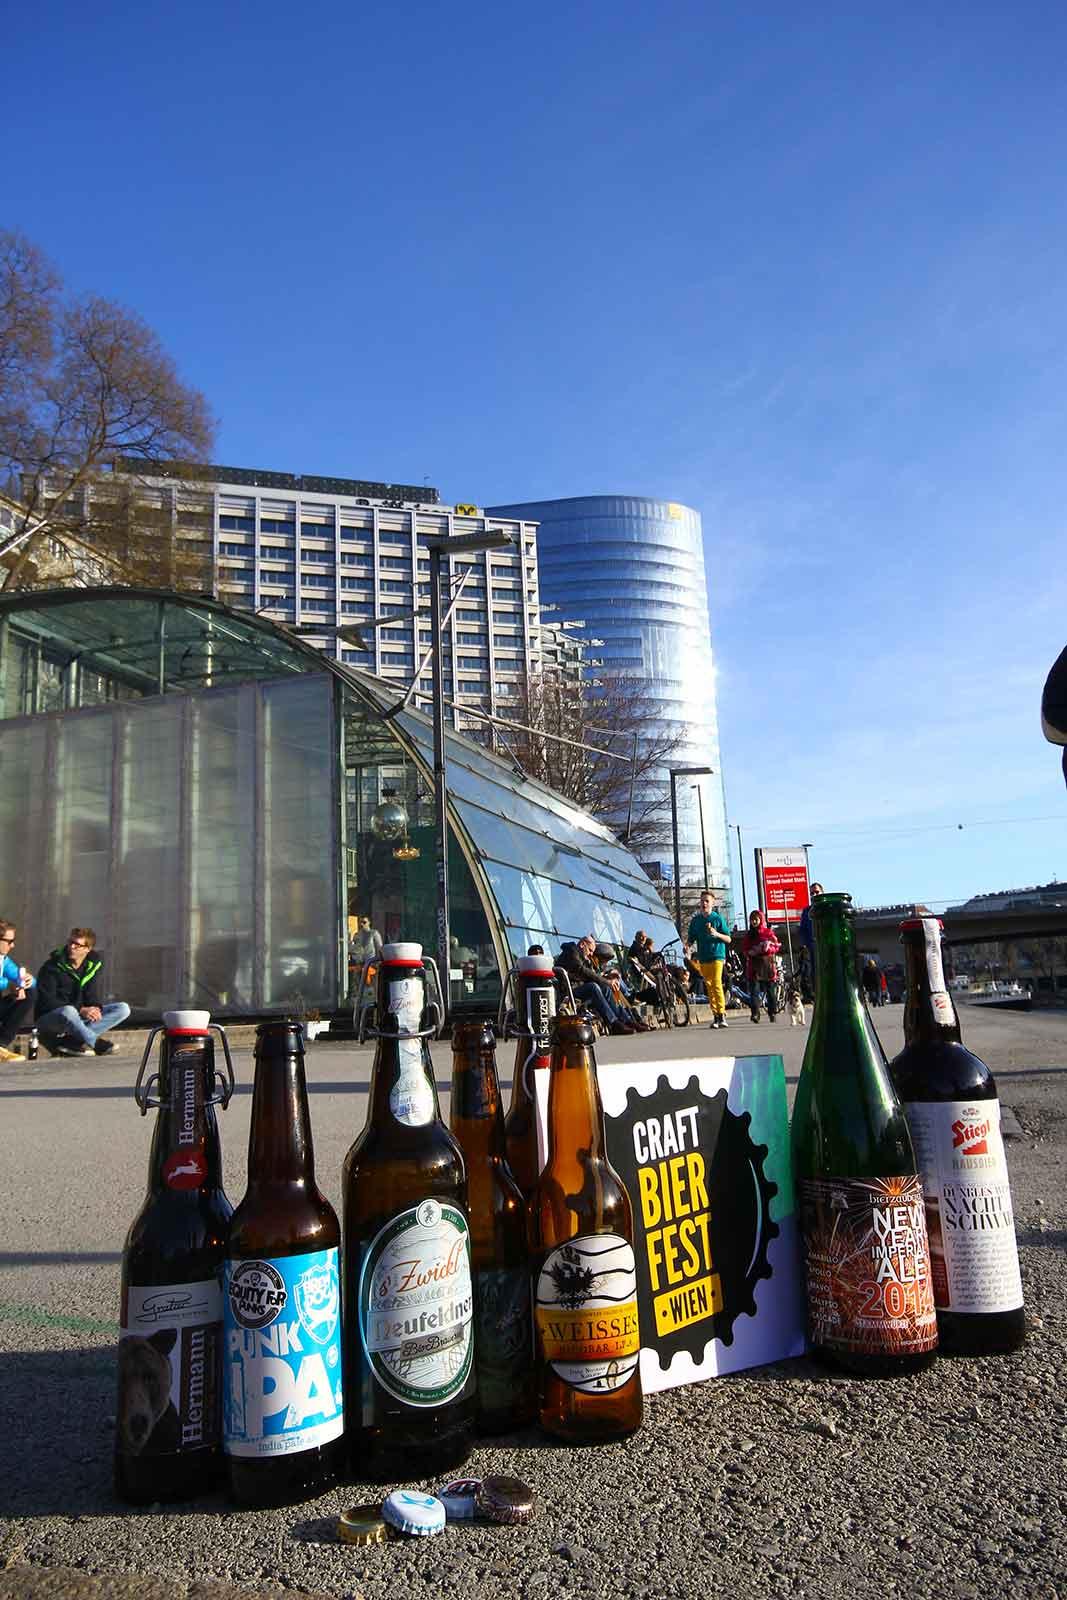 Craftbier Fest Bottles